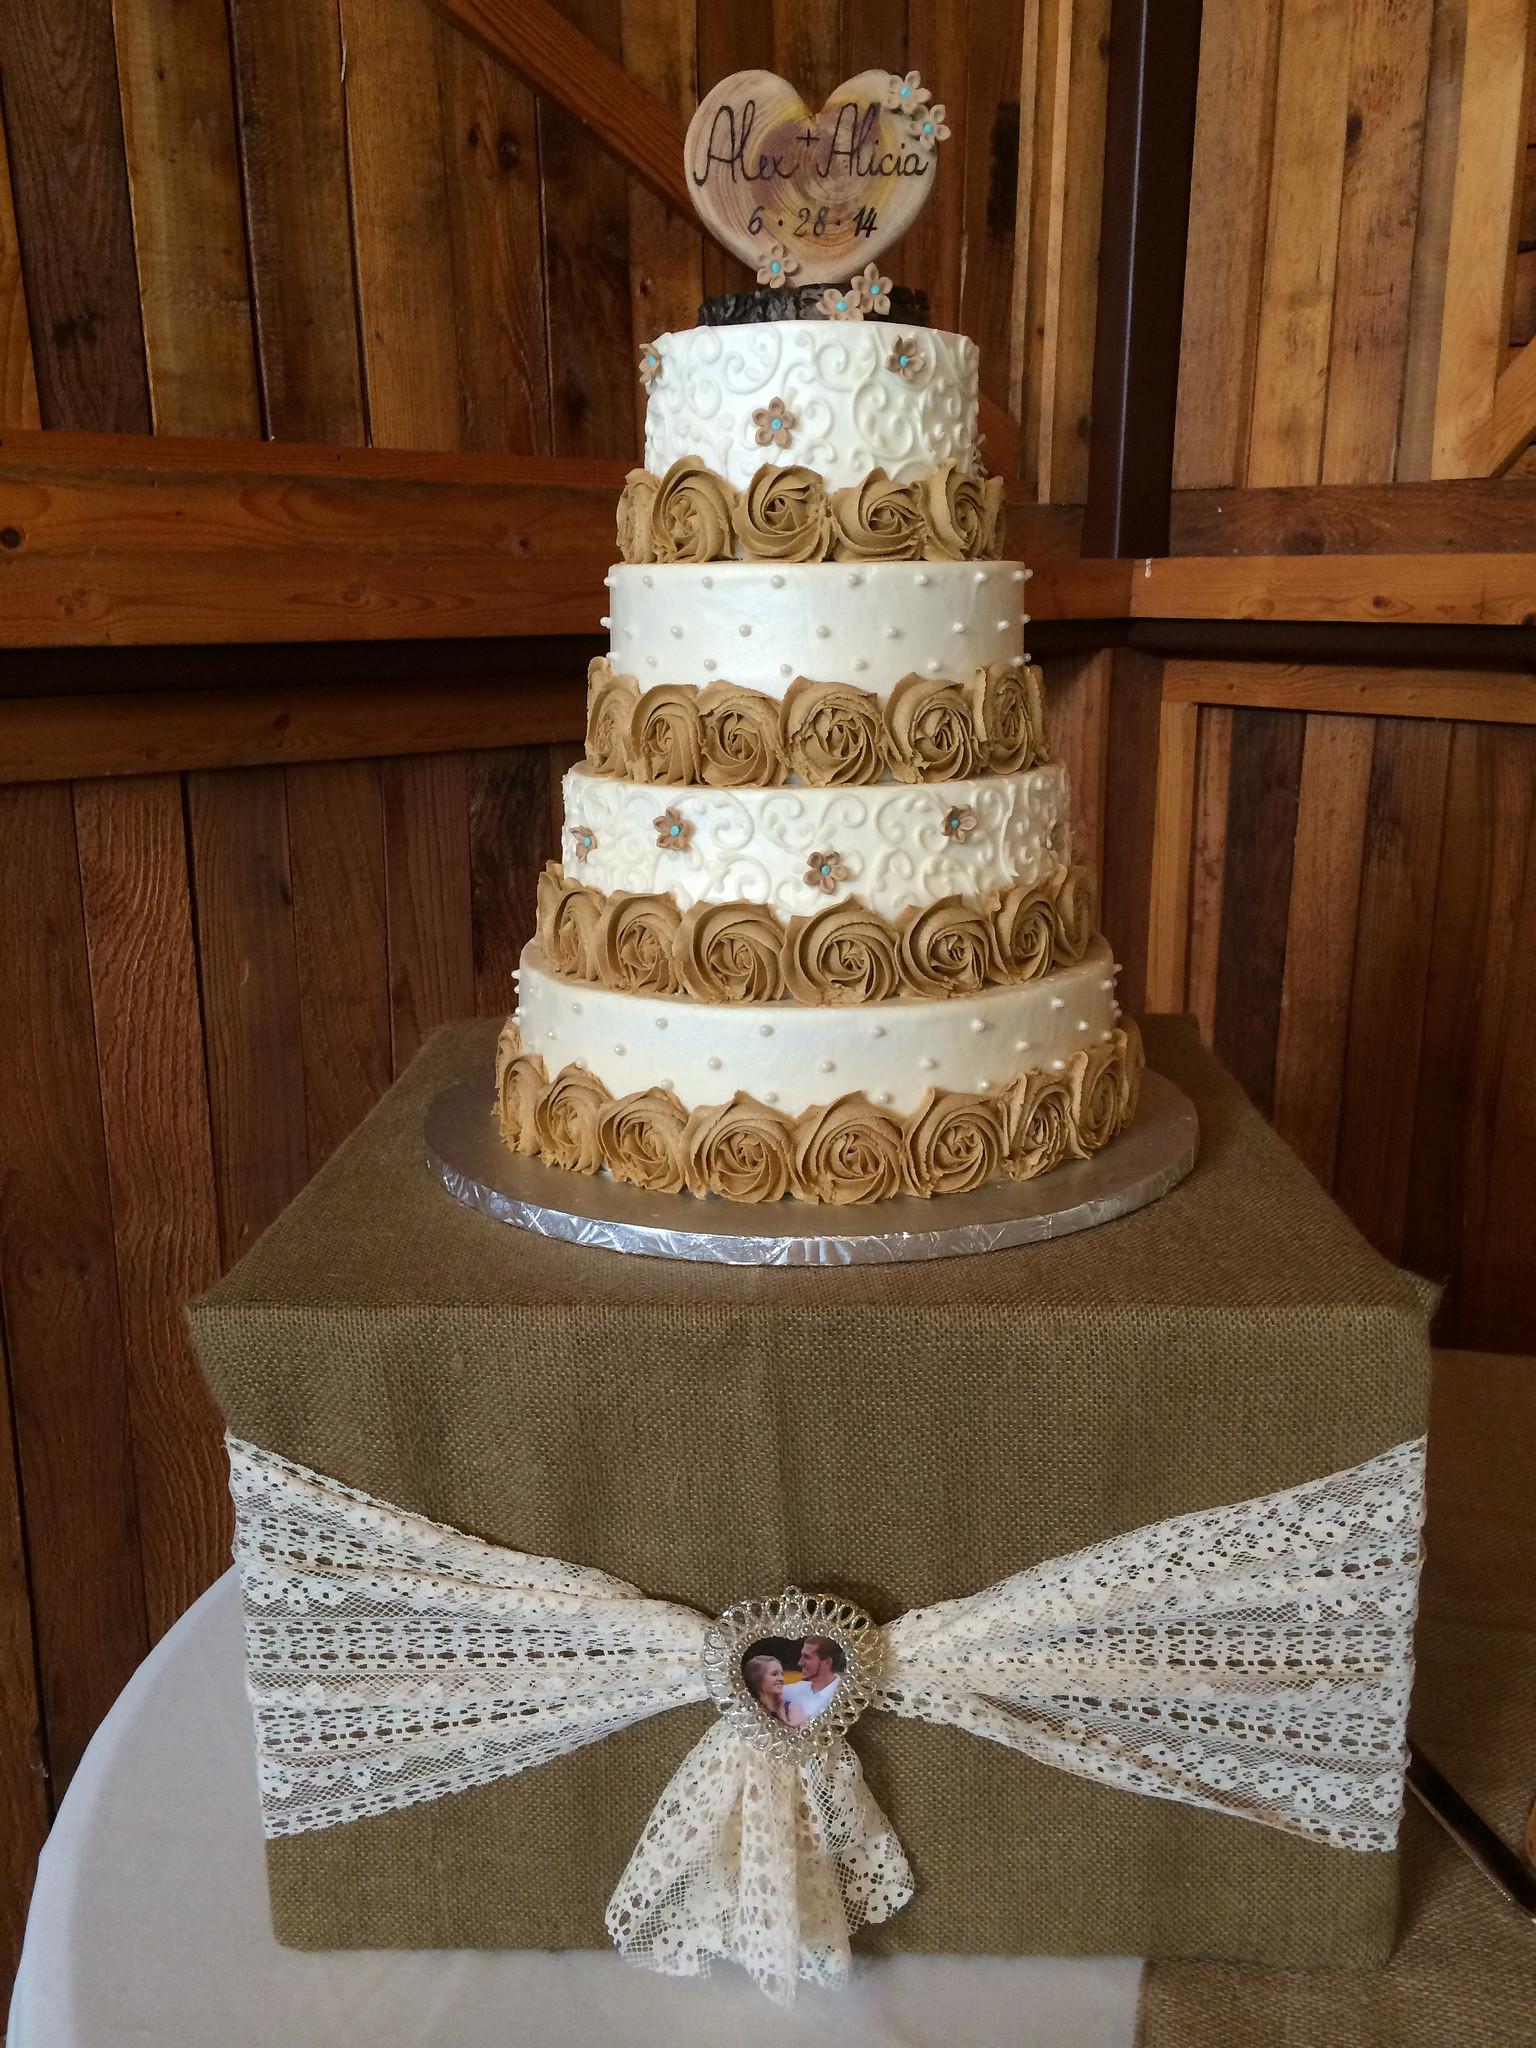 Wedding Cakes Dallas Tx  Wedding Cakes & Anniversary Cakes Dallas TX